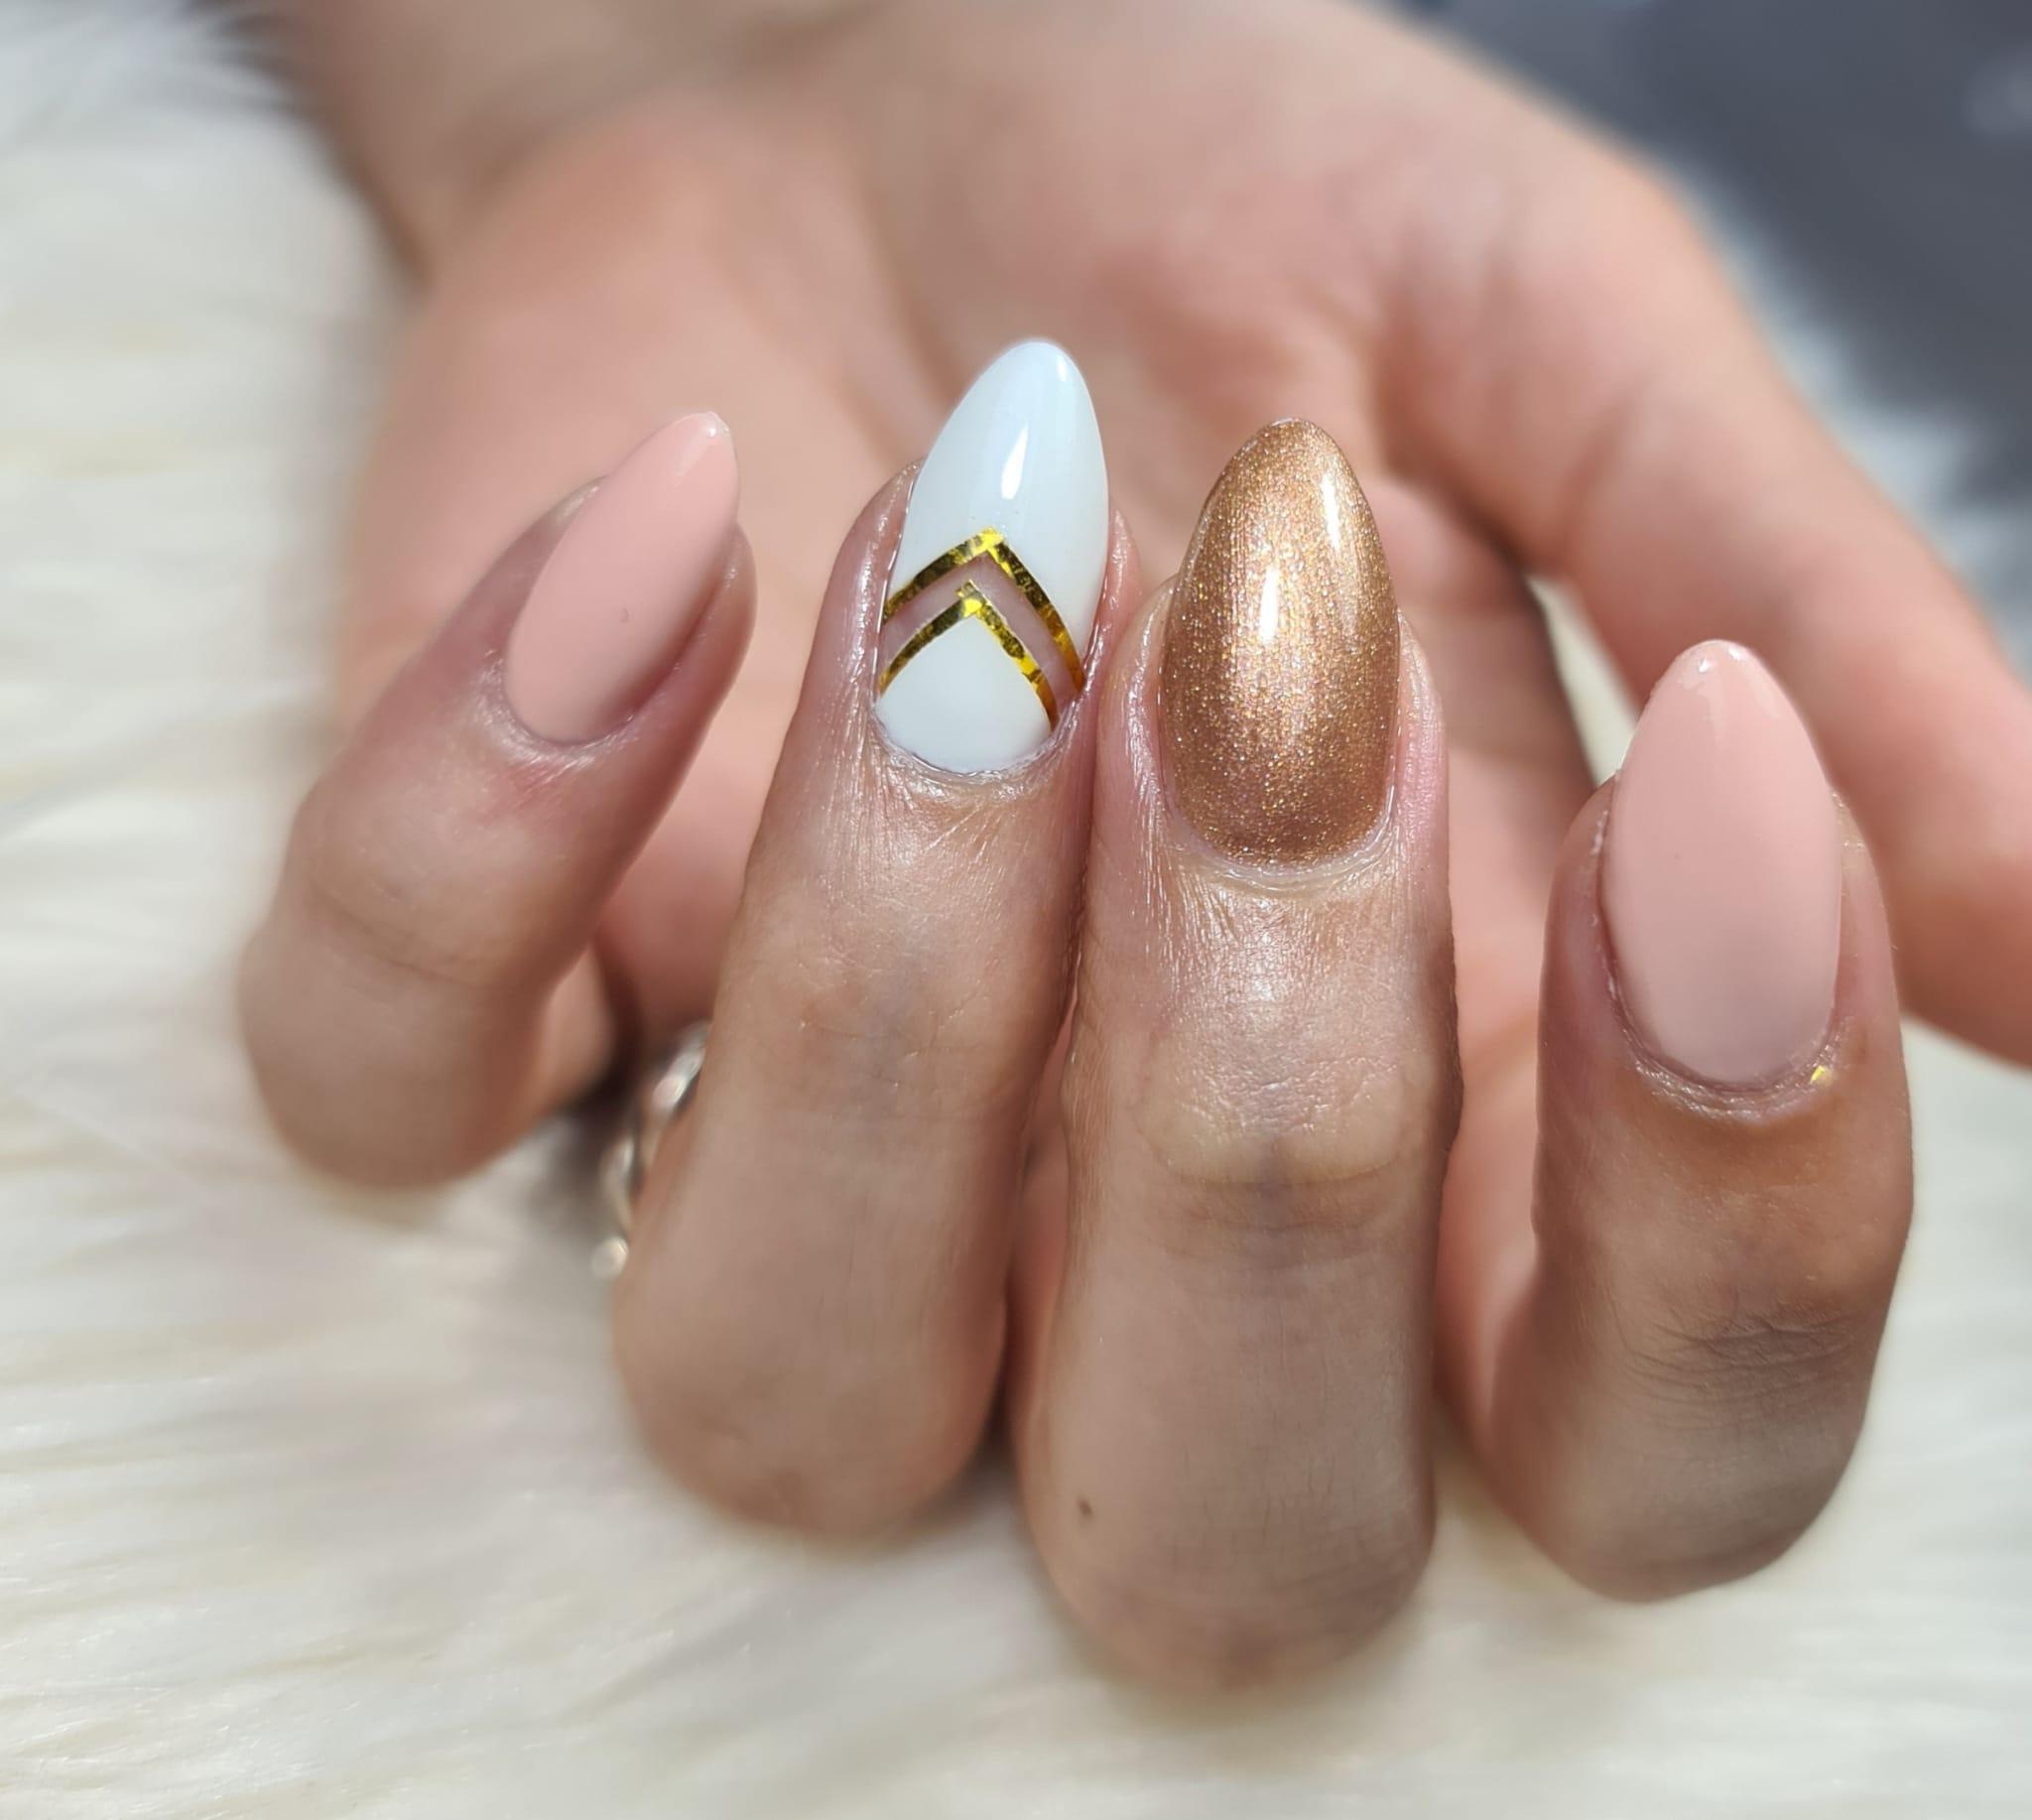 acryl nagels 2 cleyo skin experts Winschoten